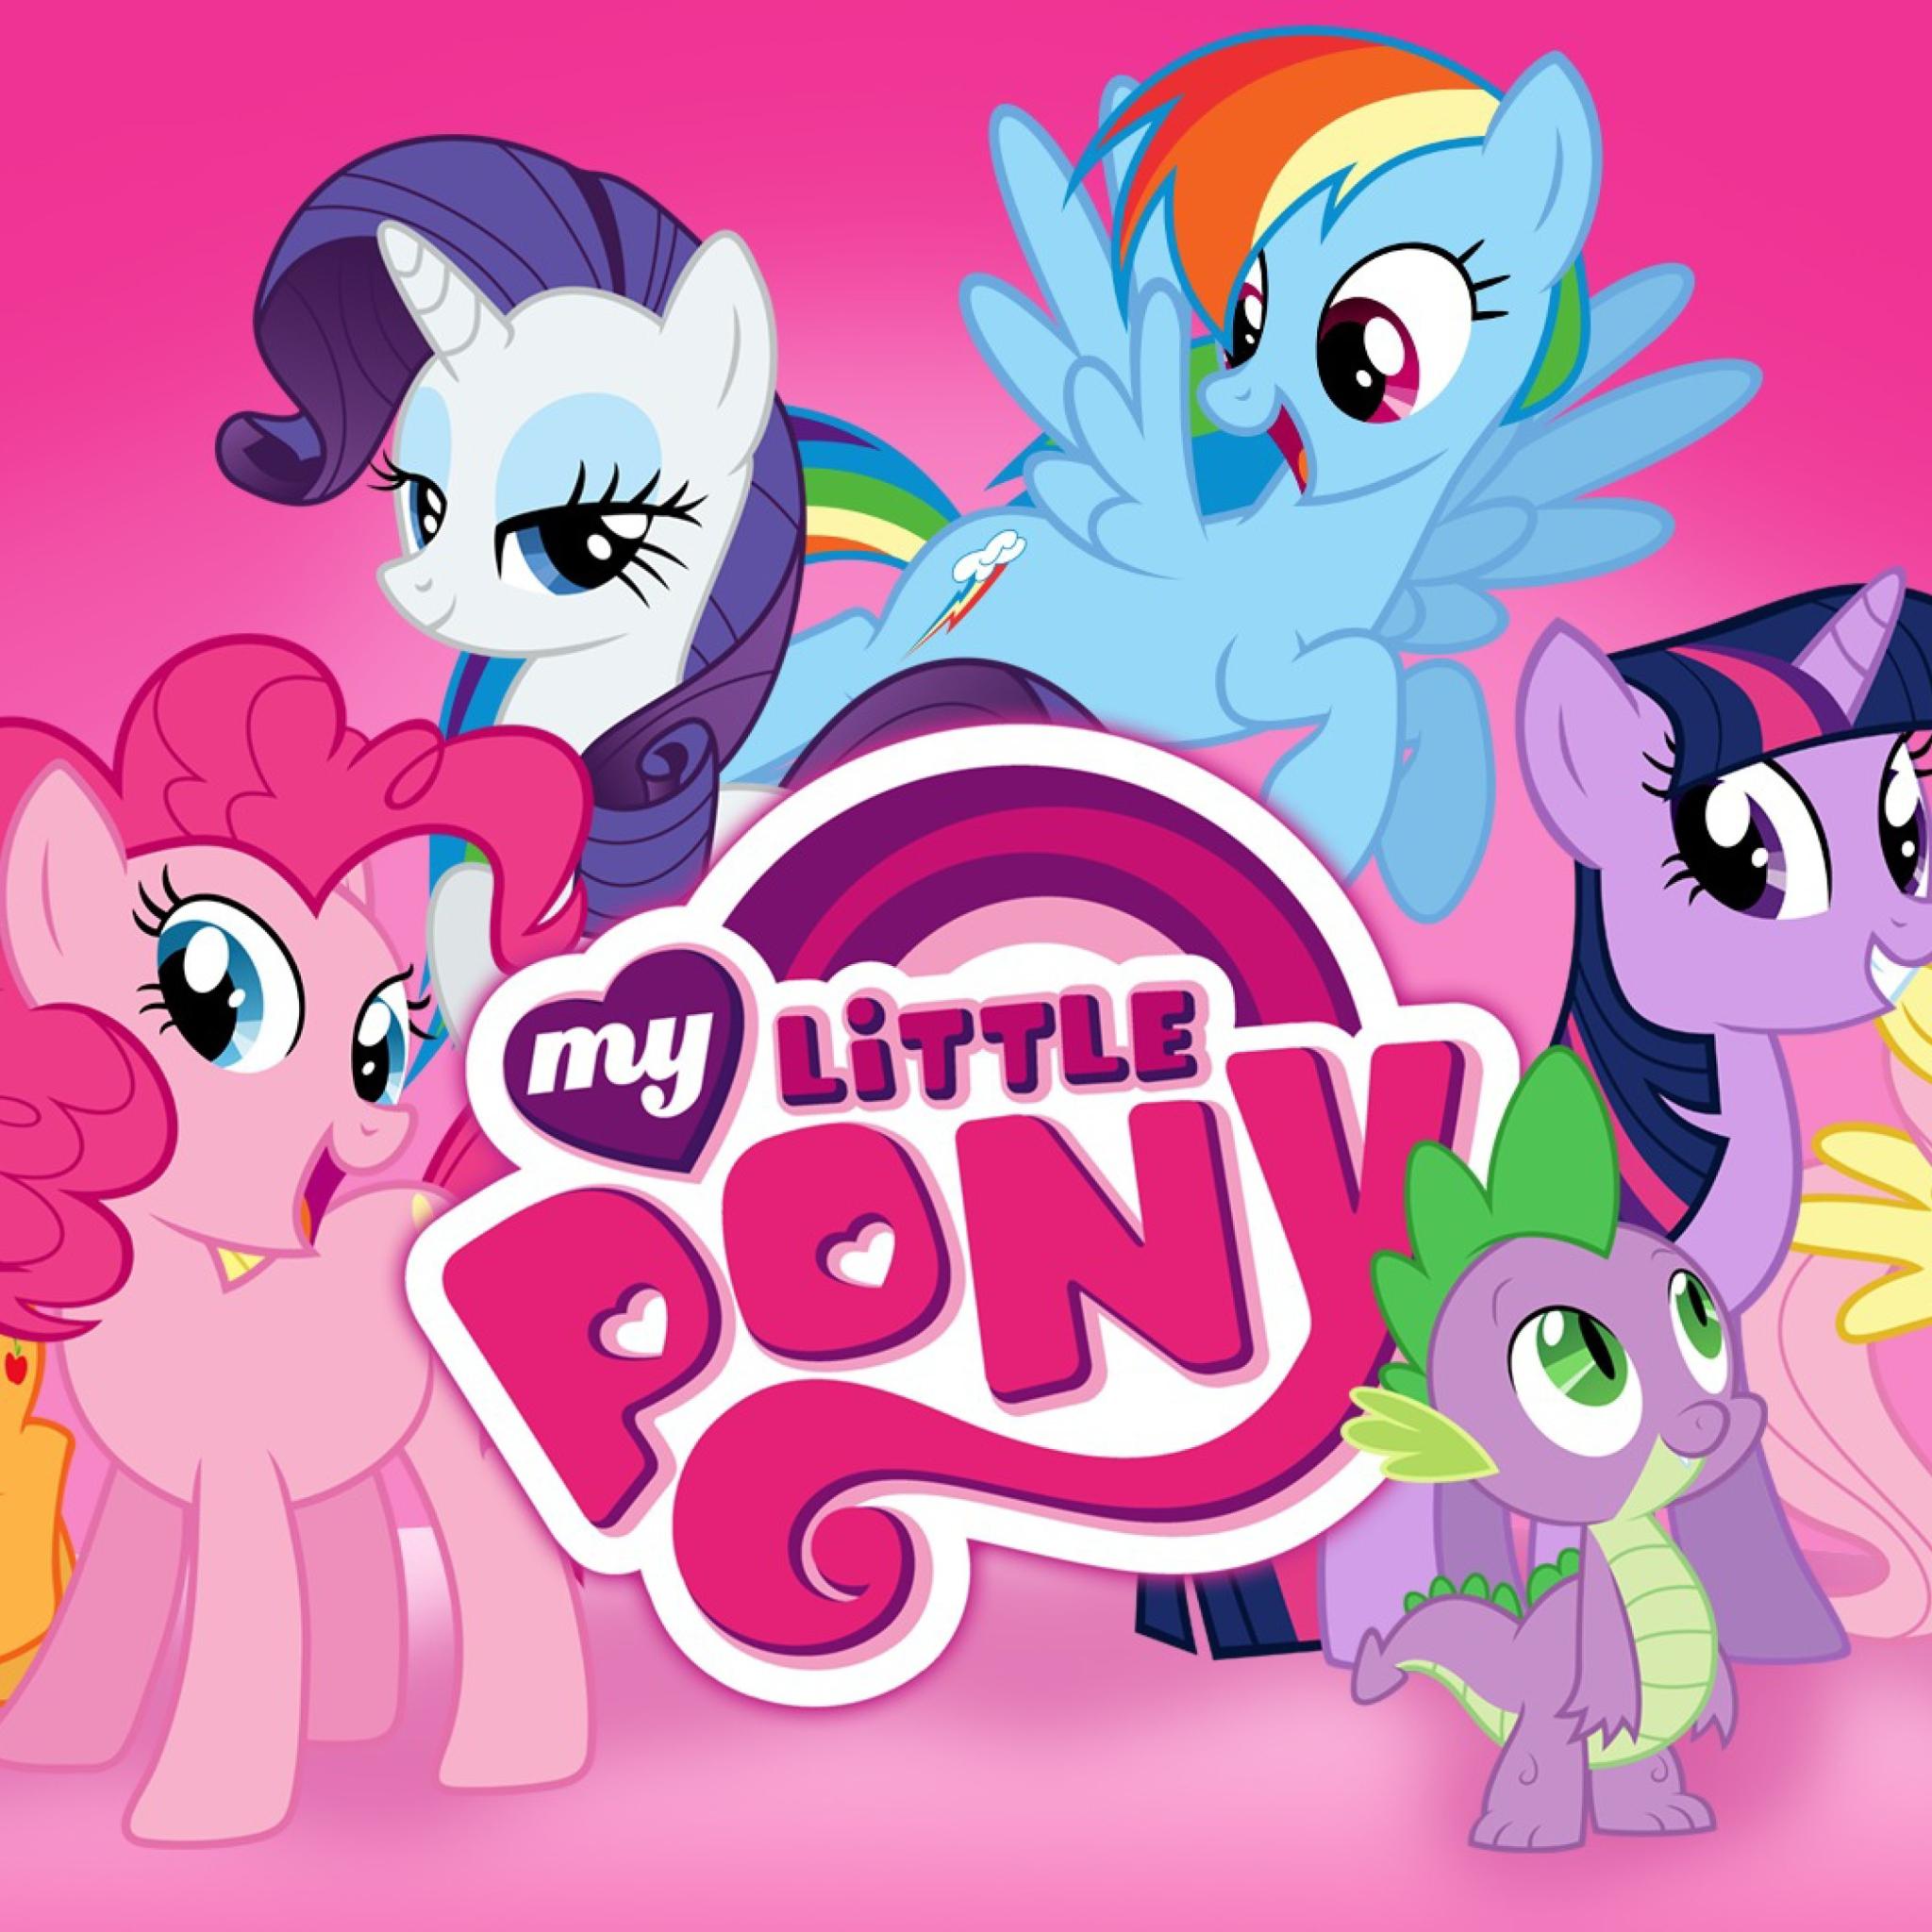 My Little Pony Wallpaper Ipad Wallpapersafari